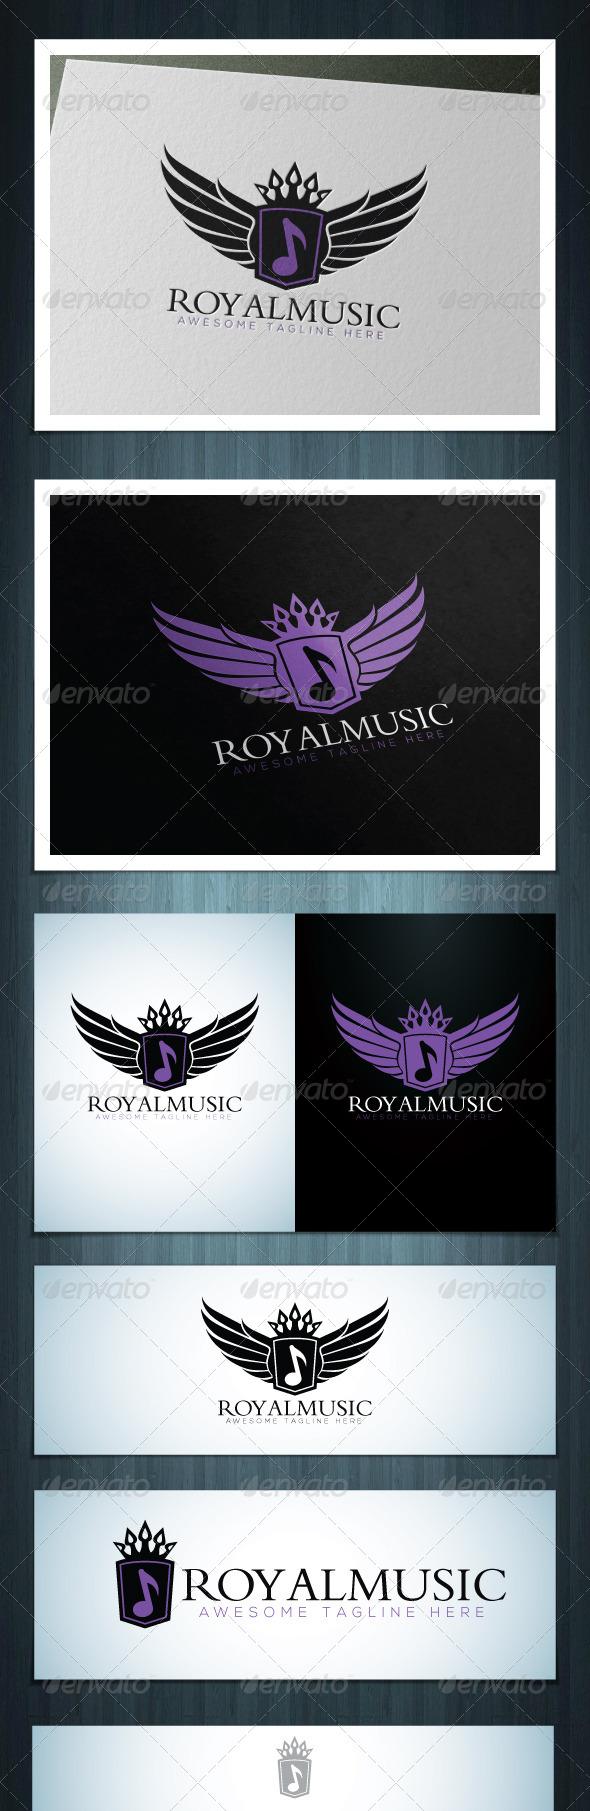 GraphicRiver Royalmusic 6507176